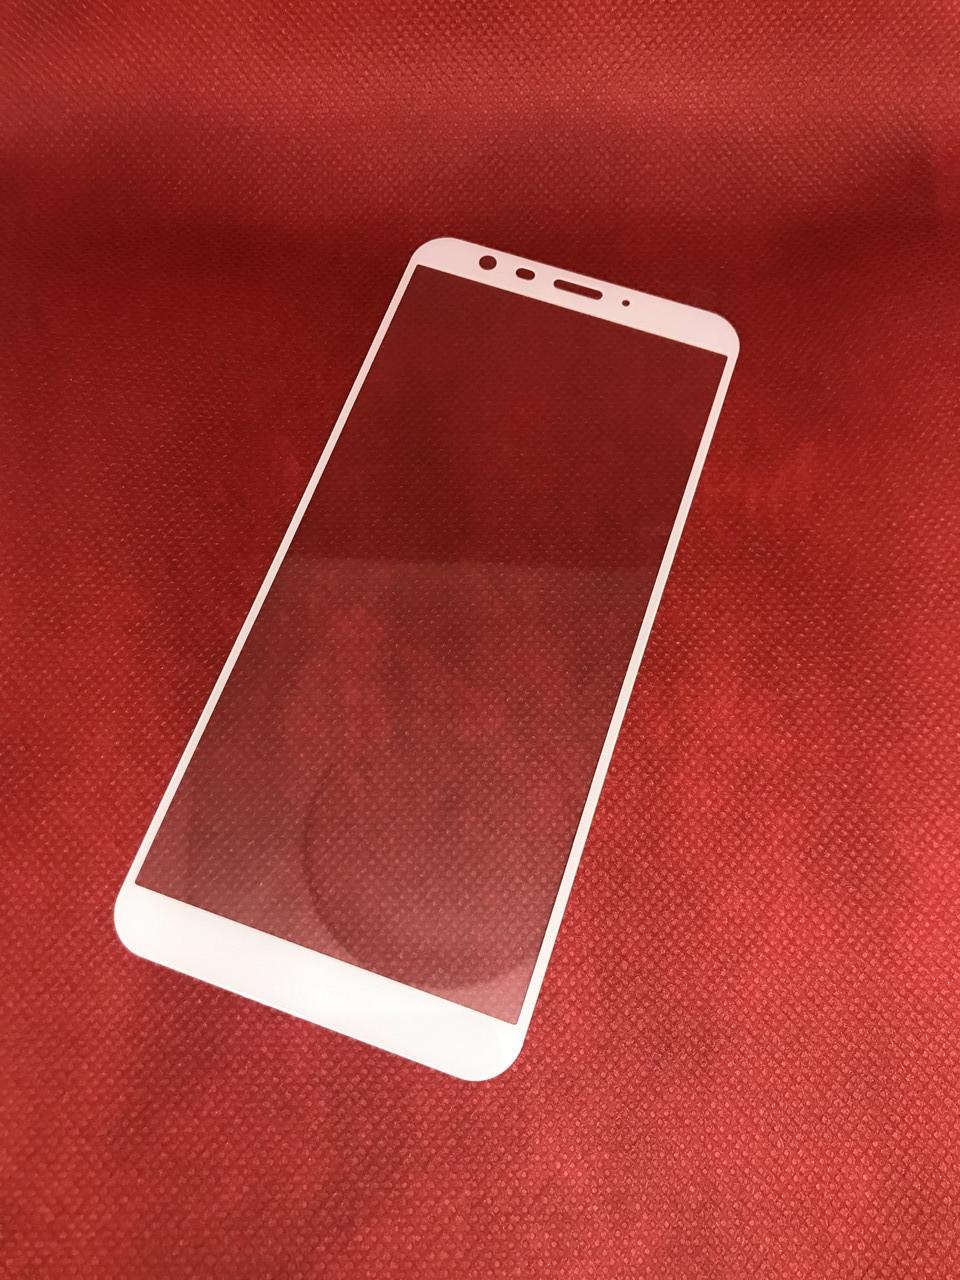 Meizu M8C защитное 2,5D 3D стекло Full Cover (белая окантовка) полное покрытие